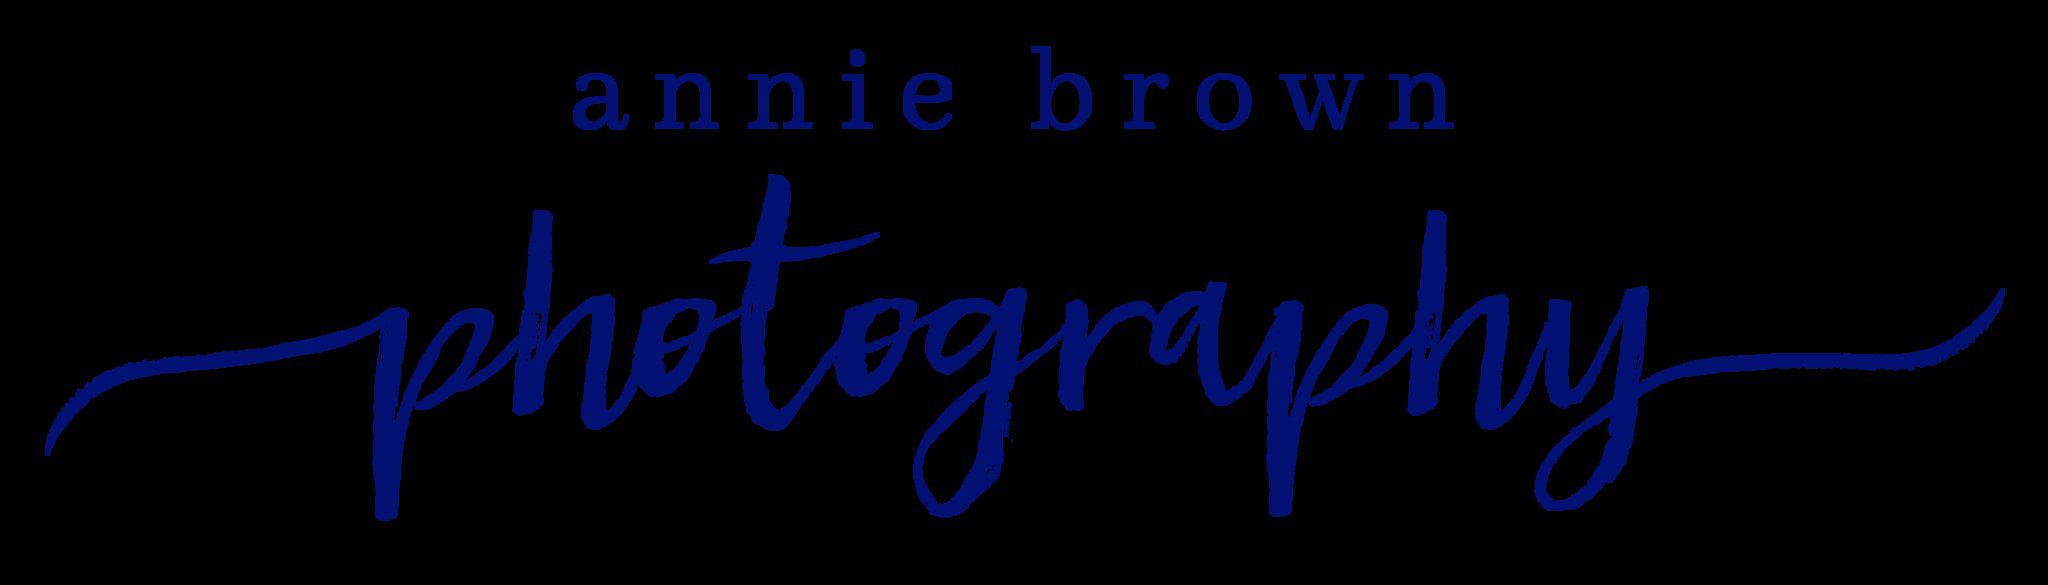 Annie Brown Photography